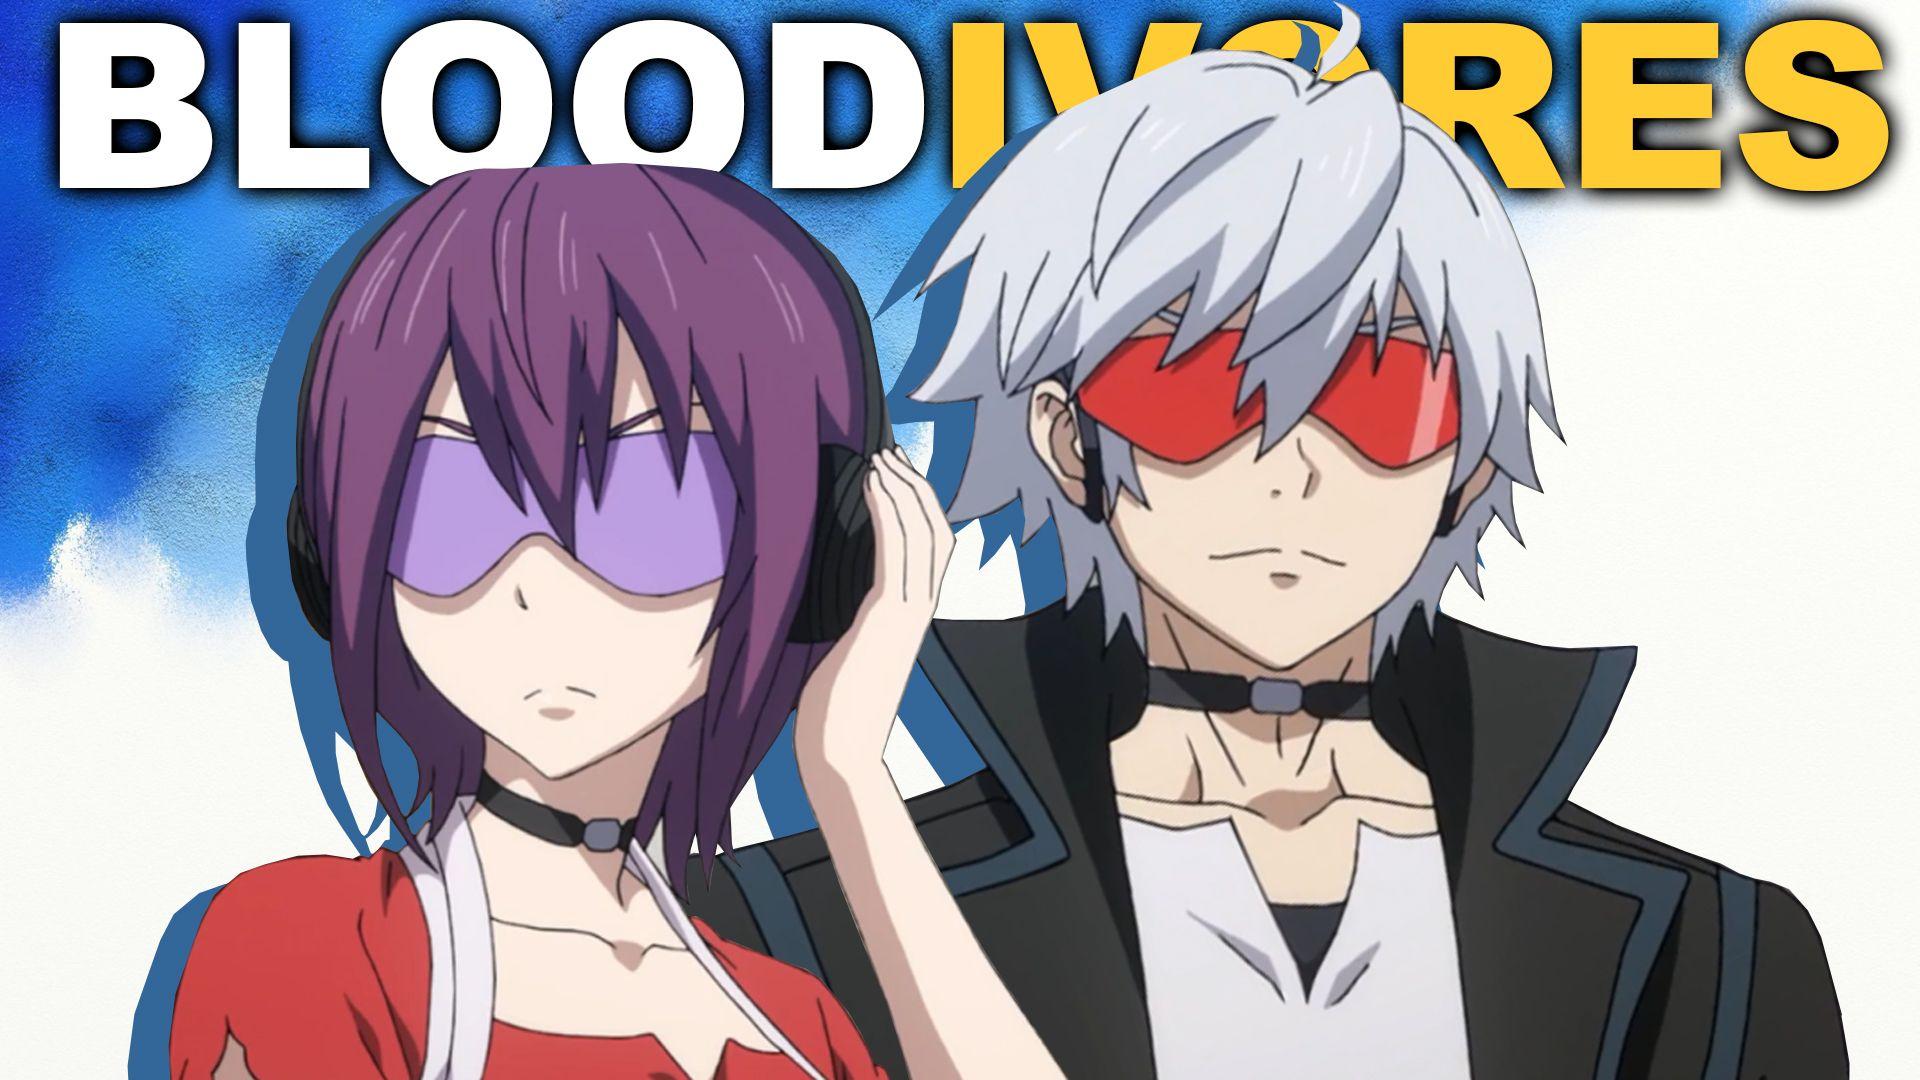 Anime bloodivores 2016 best wallpaper bloodivores - Best anime wallpaper 2016 ...